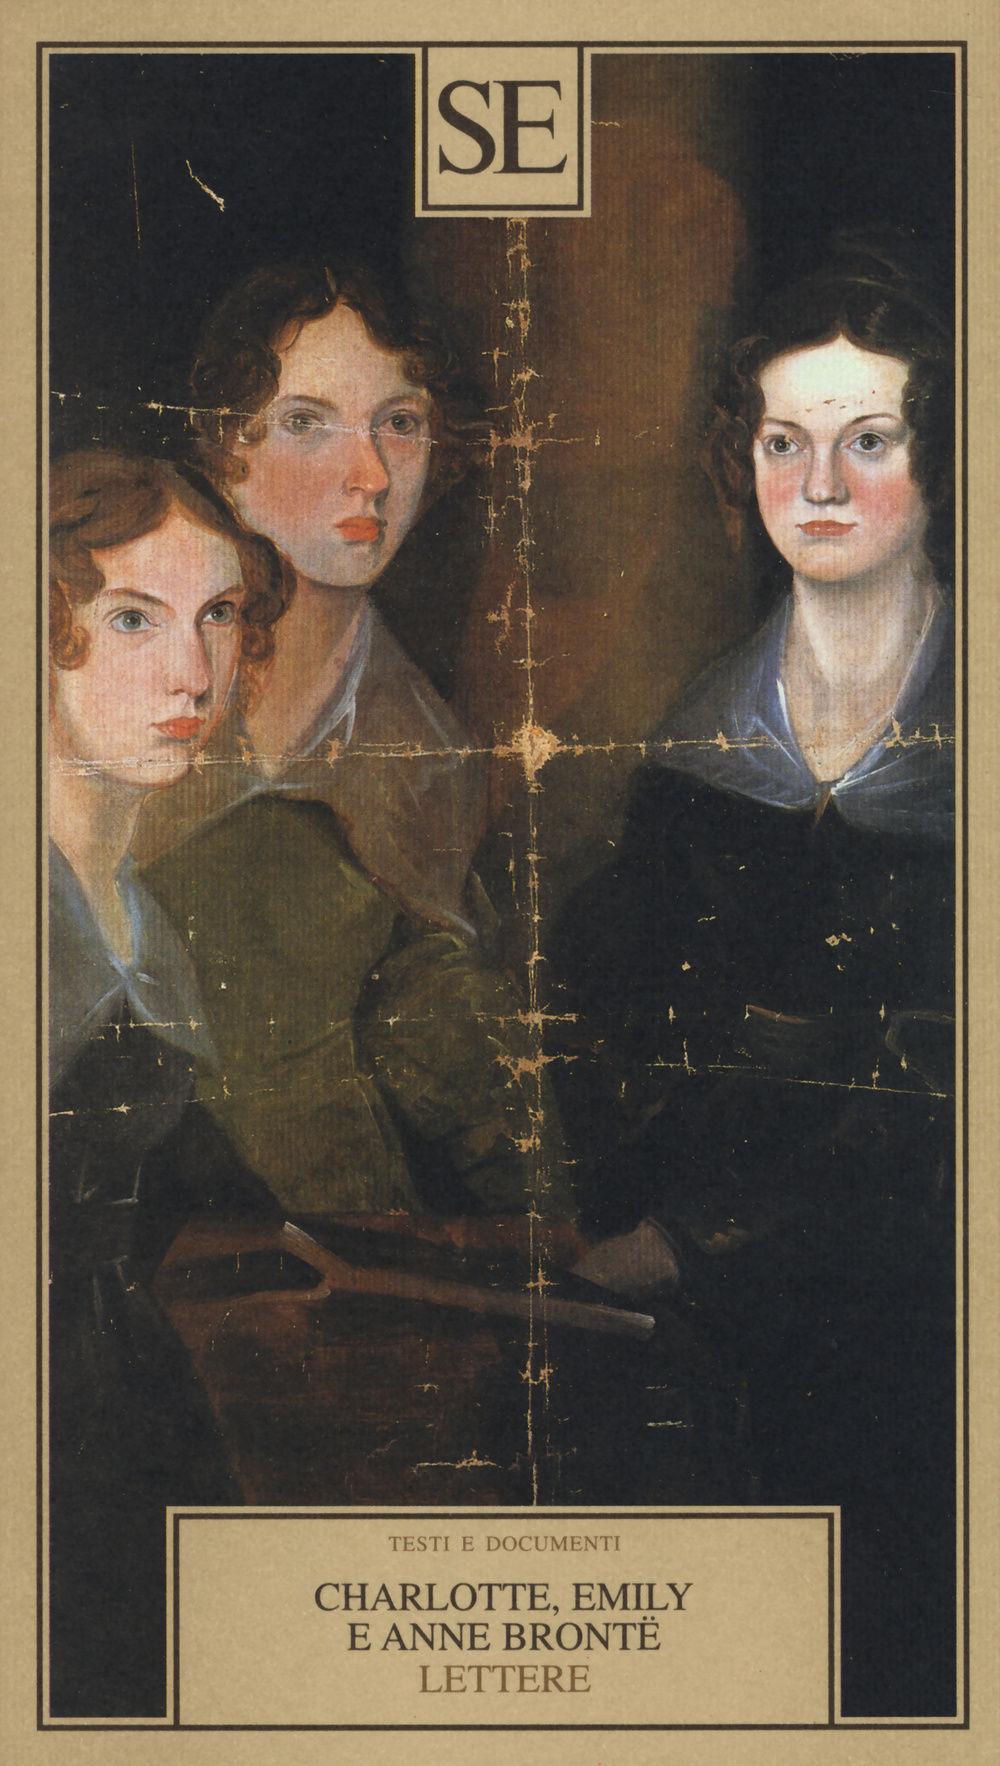 Charlotte, Emily e Anne Brontë